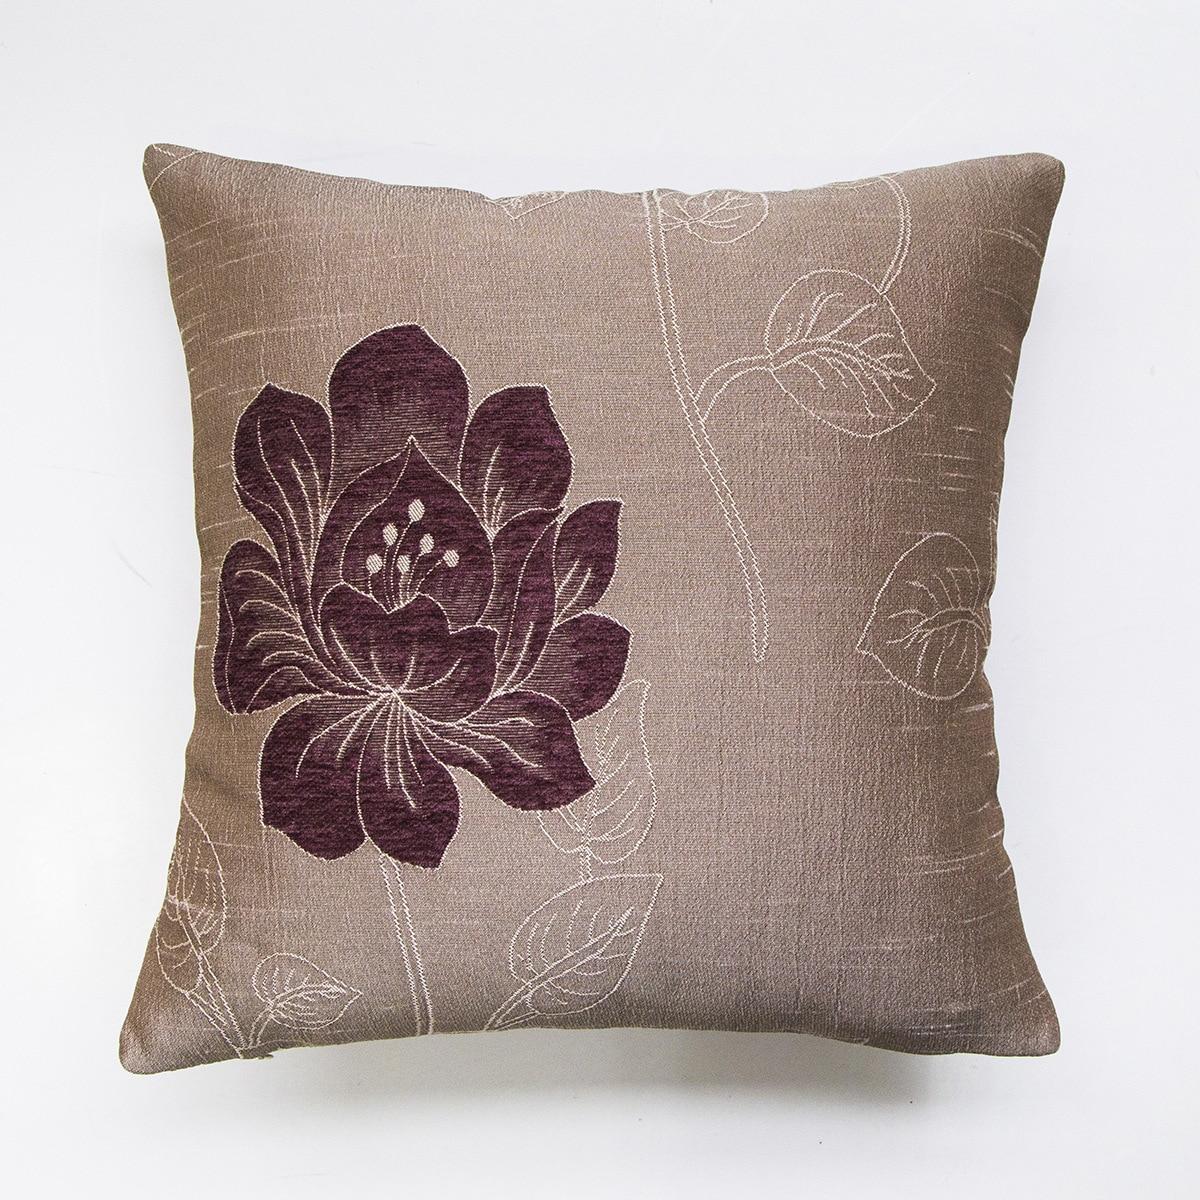 Search Warm Store Nantong More Beautiful Home Fabric Jacquard Weave Embrace Pillow Case Cushion Set Hair